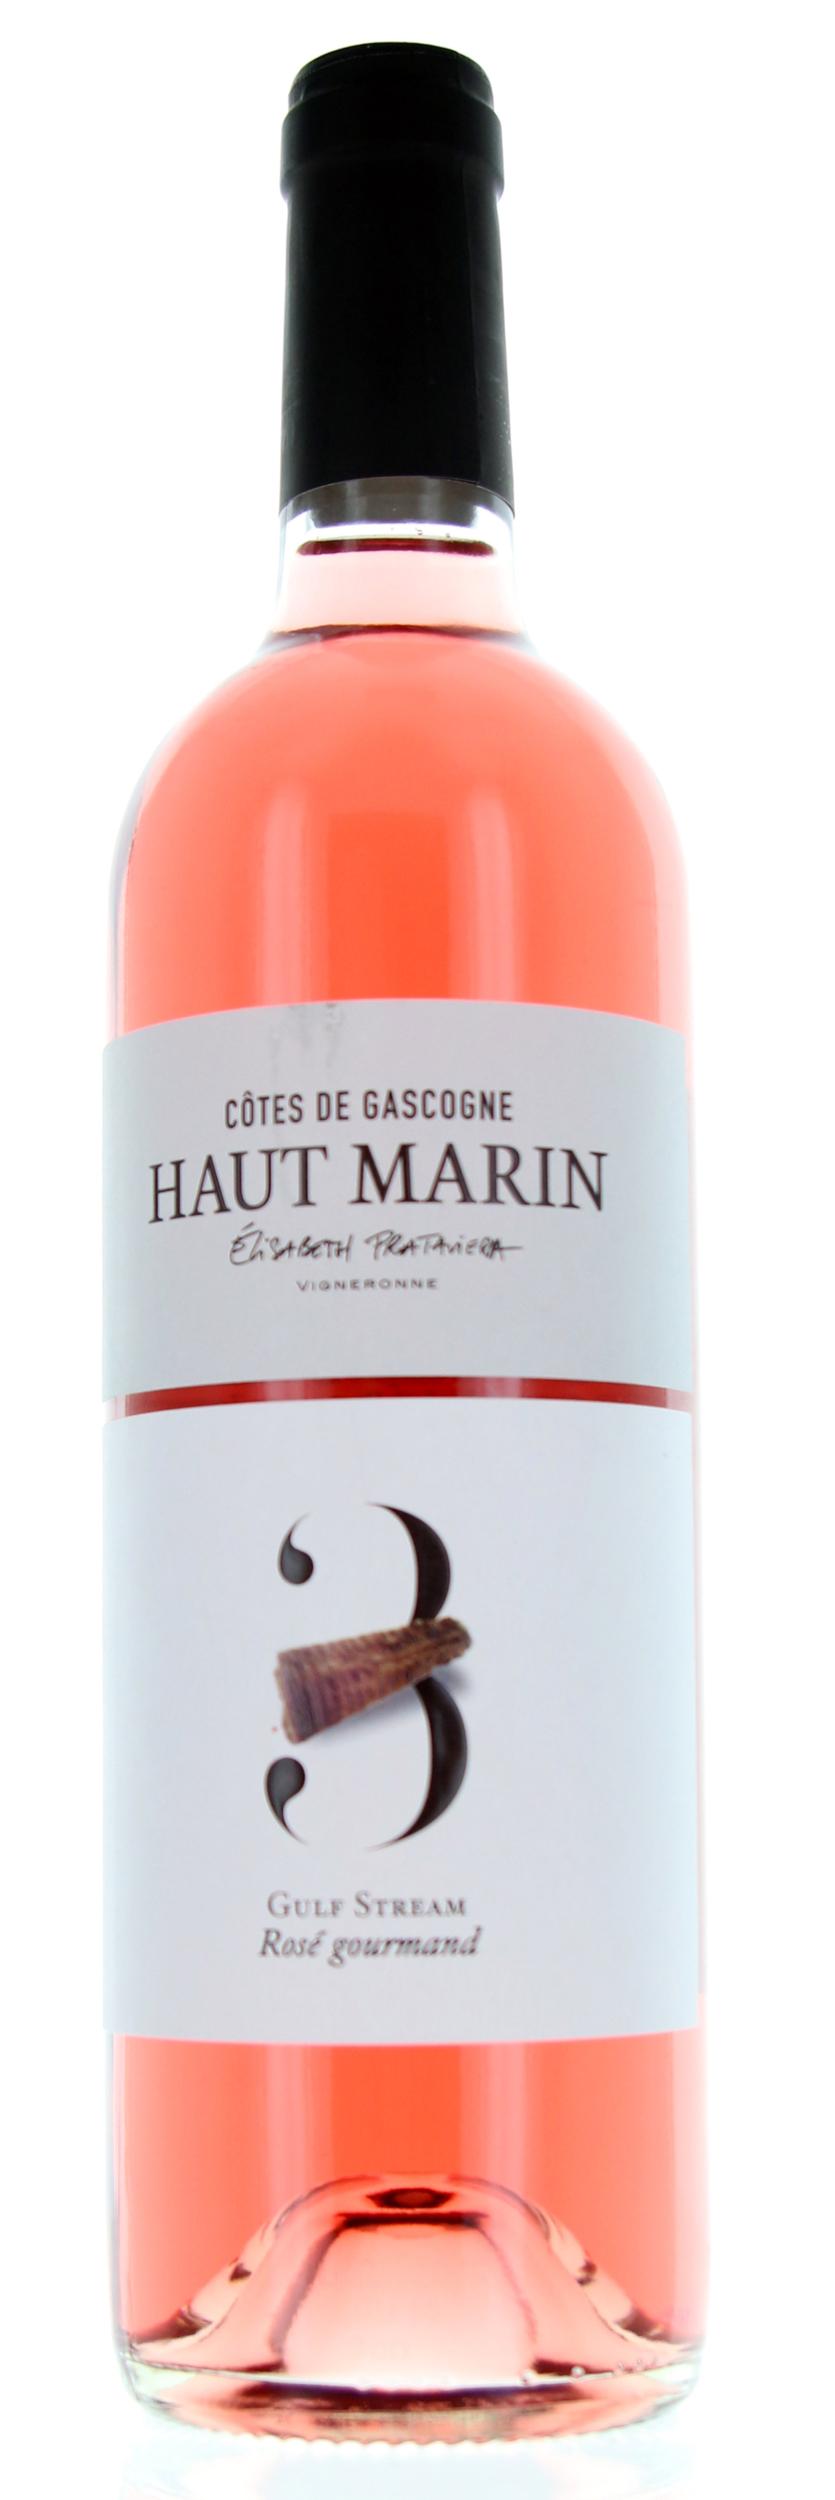 Côtes de Gascogne - Gulf Stream N°3 - Domaine Haut-Marin - 2018